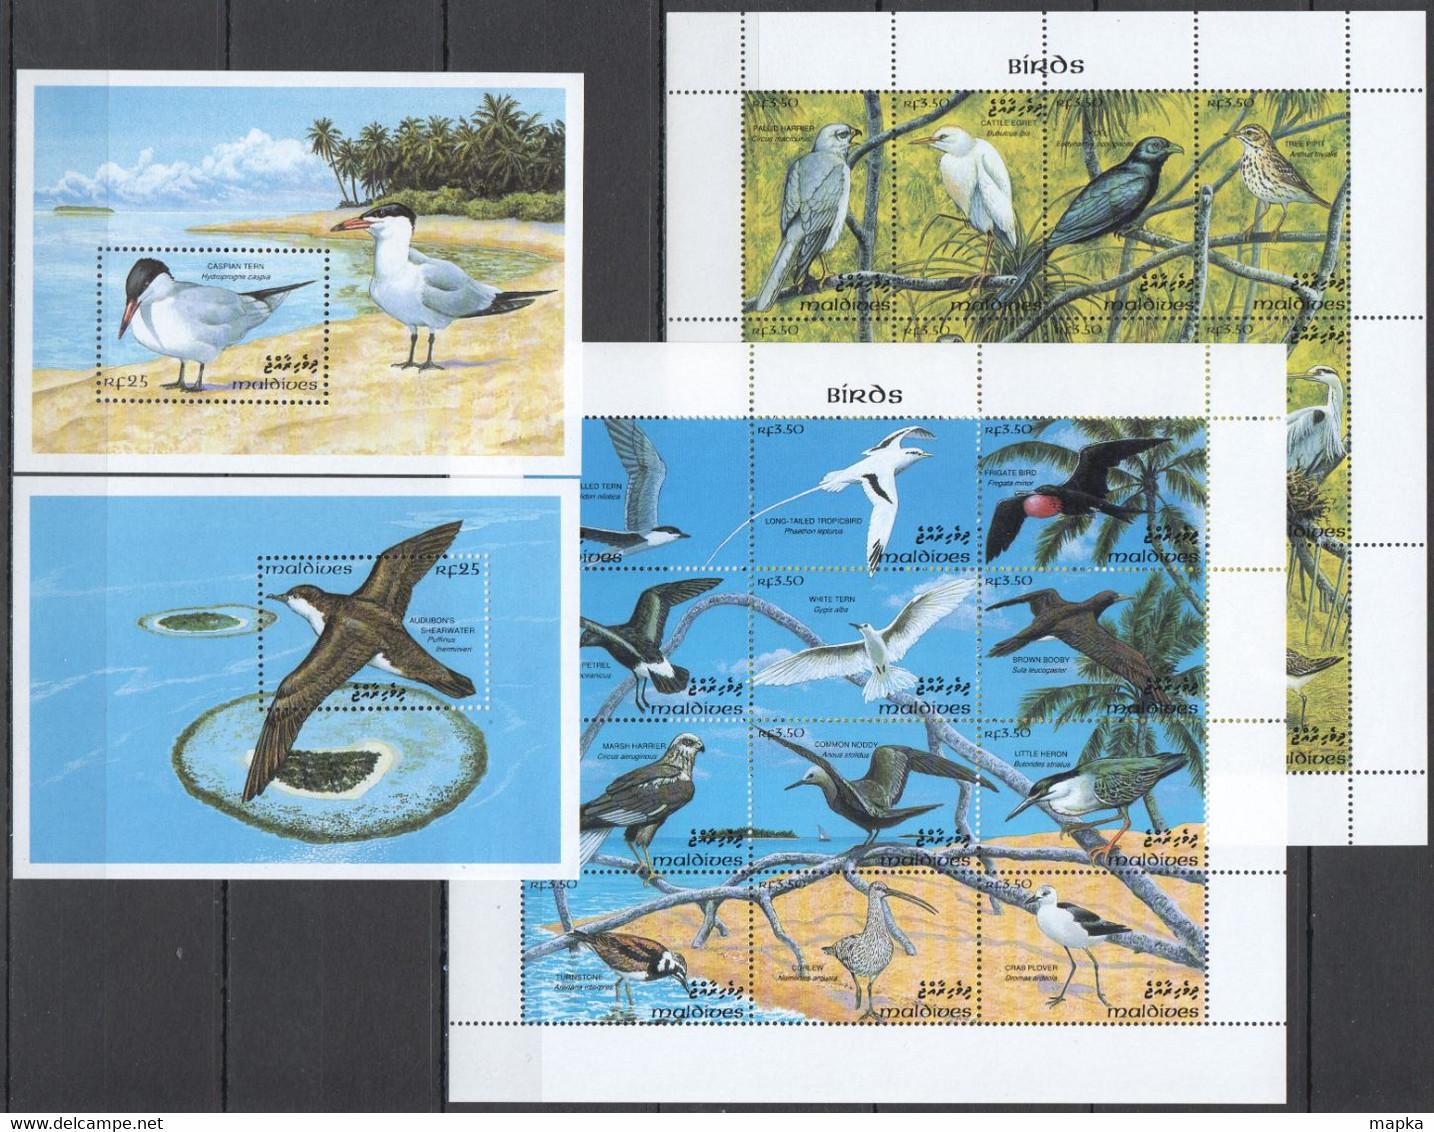 XX723 MALDIVES FAUNA MARINE LIFE BIRDS MICHEL 38 EURO 2KB+2BL MNH - Otros